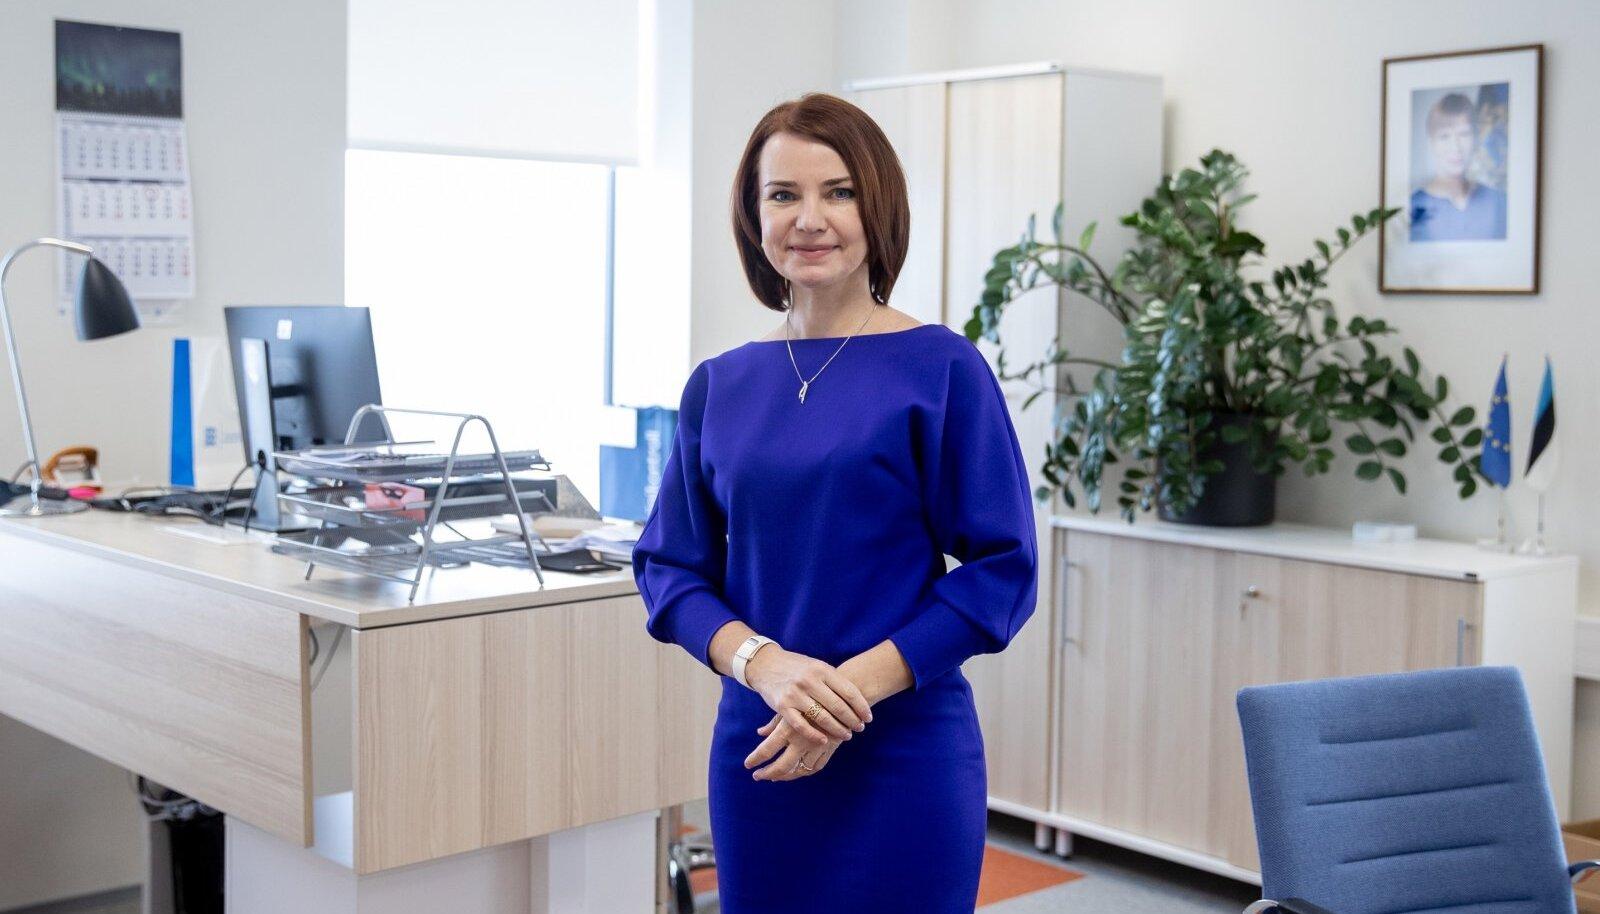 Rahandusminister Keit Pentus-Rosimannus